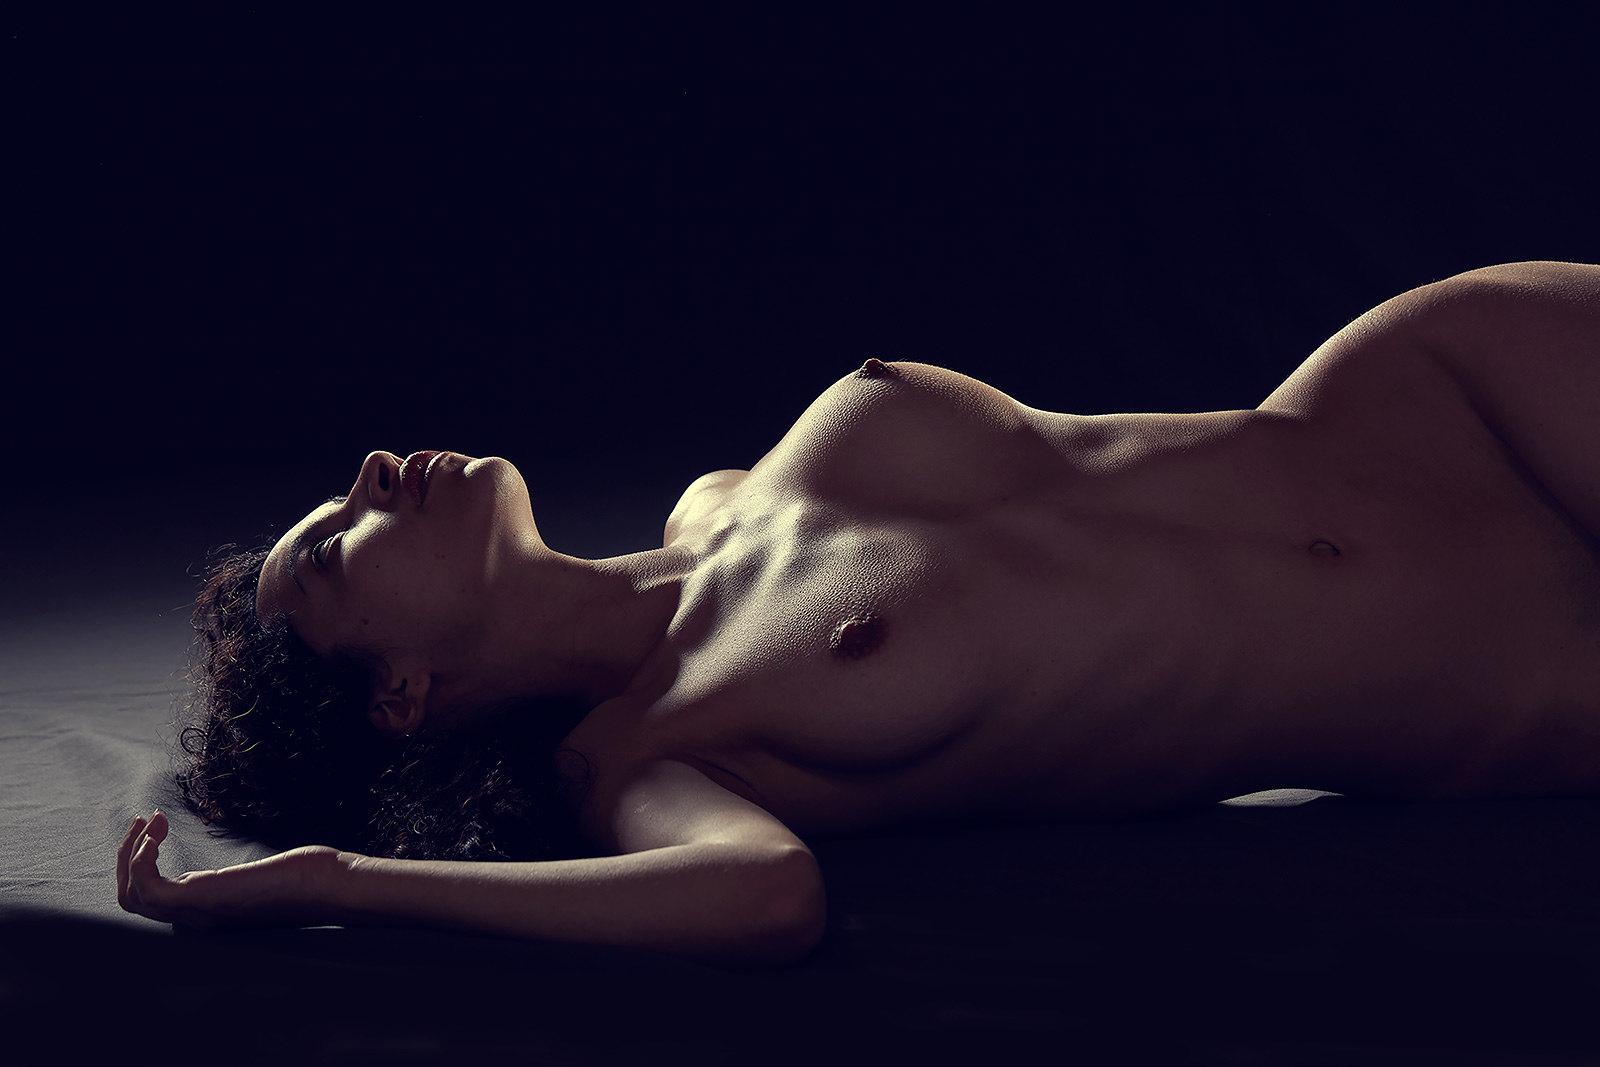 Desnudos by fabianpulido.com